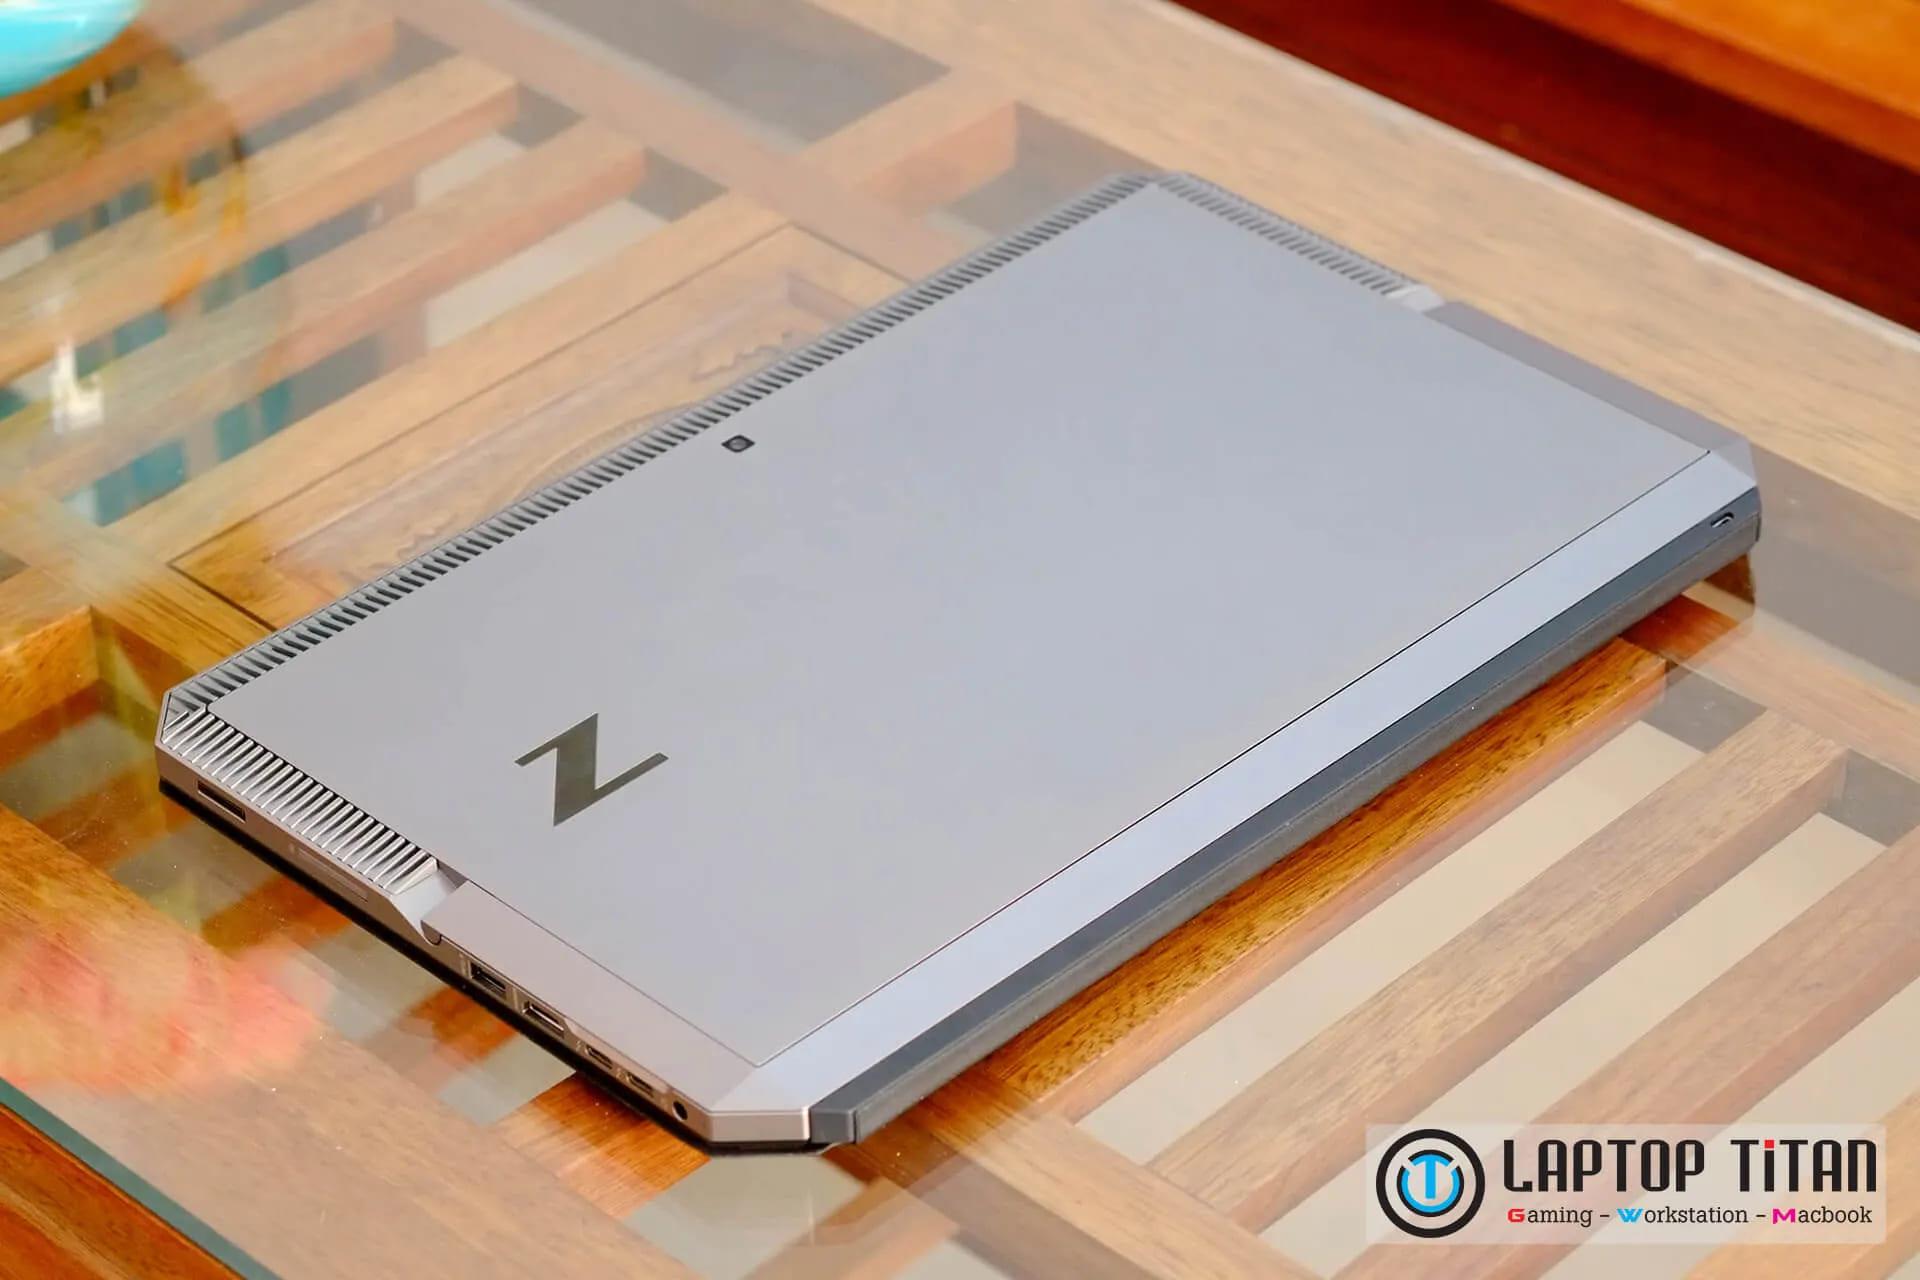 Hp Zbook X2 G4 Laptoptitan 03